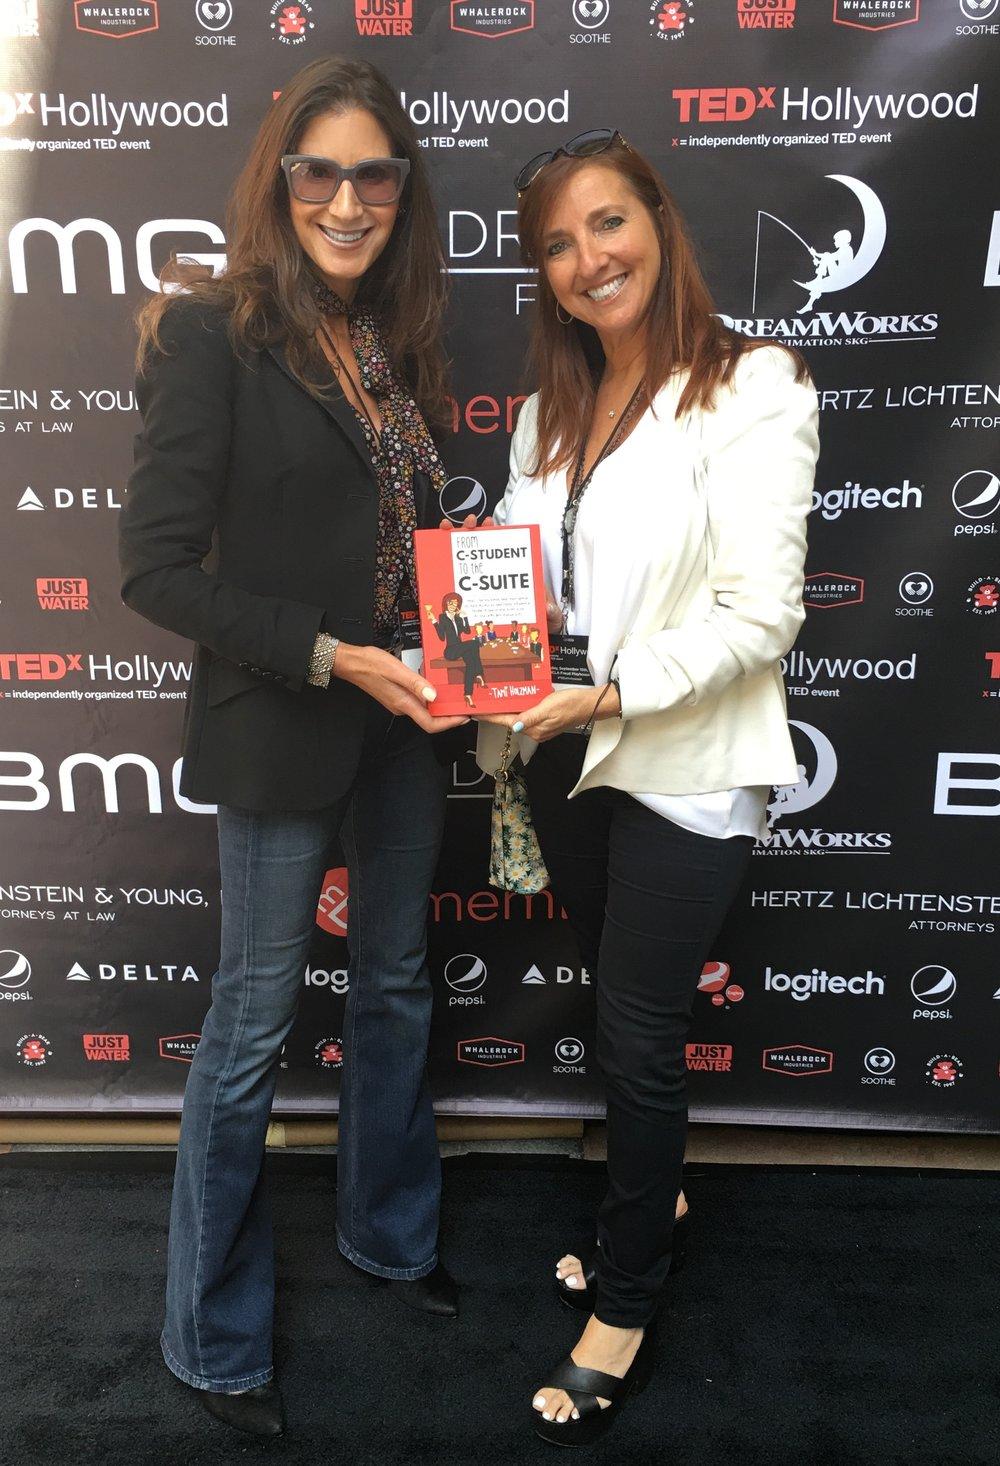 #TamiHolzman Tami Holzman #Keynotespeaker, Keynote Speaker, #emotionalintellegence Emotional Intelligence, #eq #csuite C-Suite #sales Sales #Author #Writer #Speaker, Author, female empowerment, #Business Business #Press Press#TED